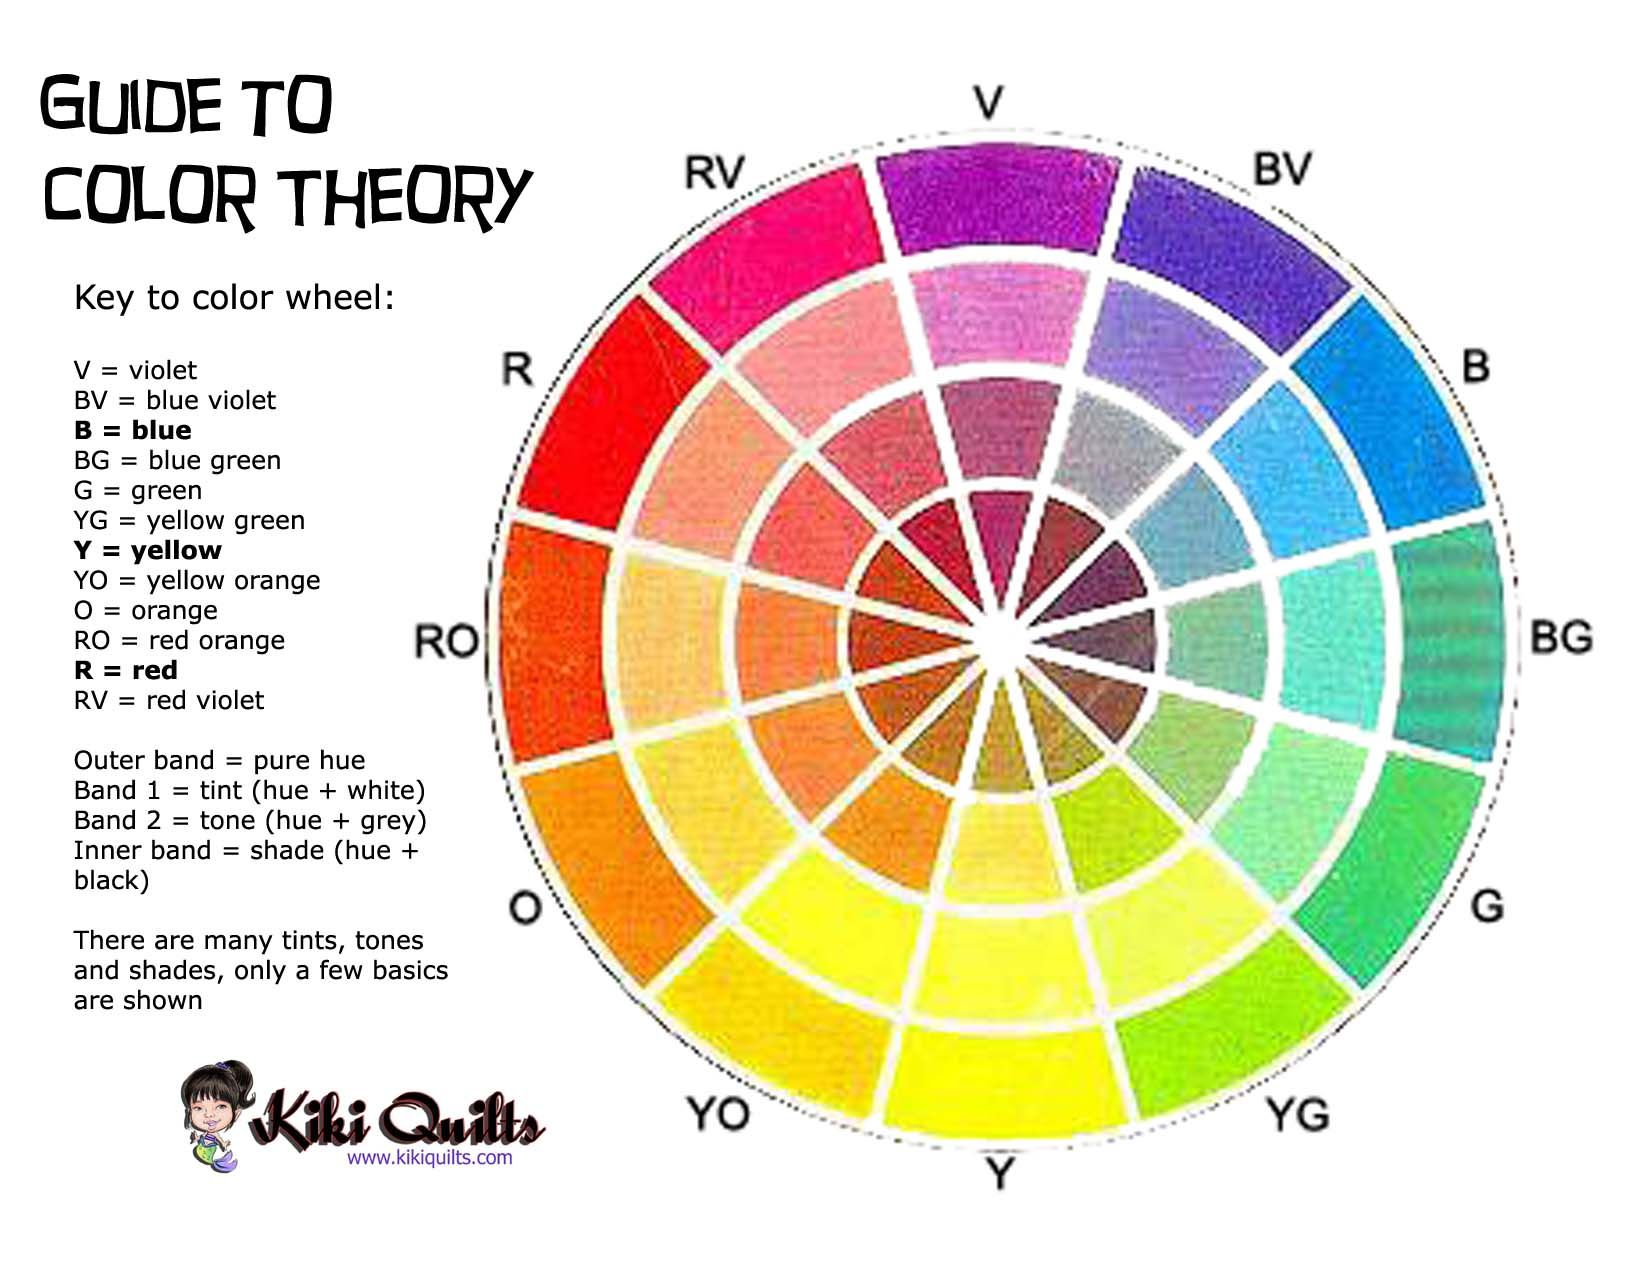 Color Wheel Shows Pure Hues Tints Tones And Shades